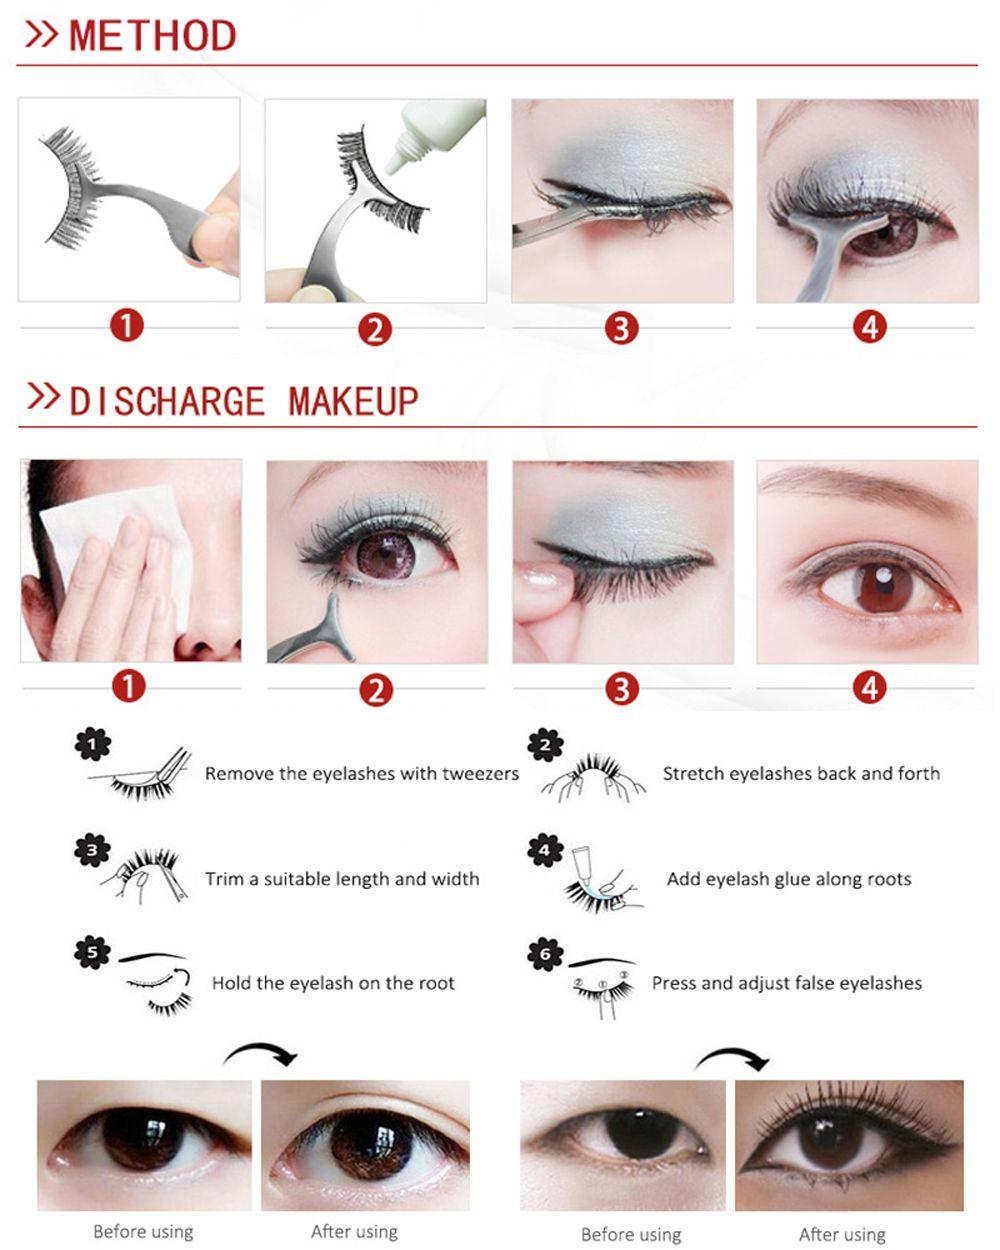 100 Pairs Makeup Daily Life Pure Handmade Black Natural Long False Eyelash Suit